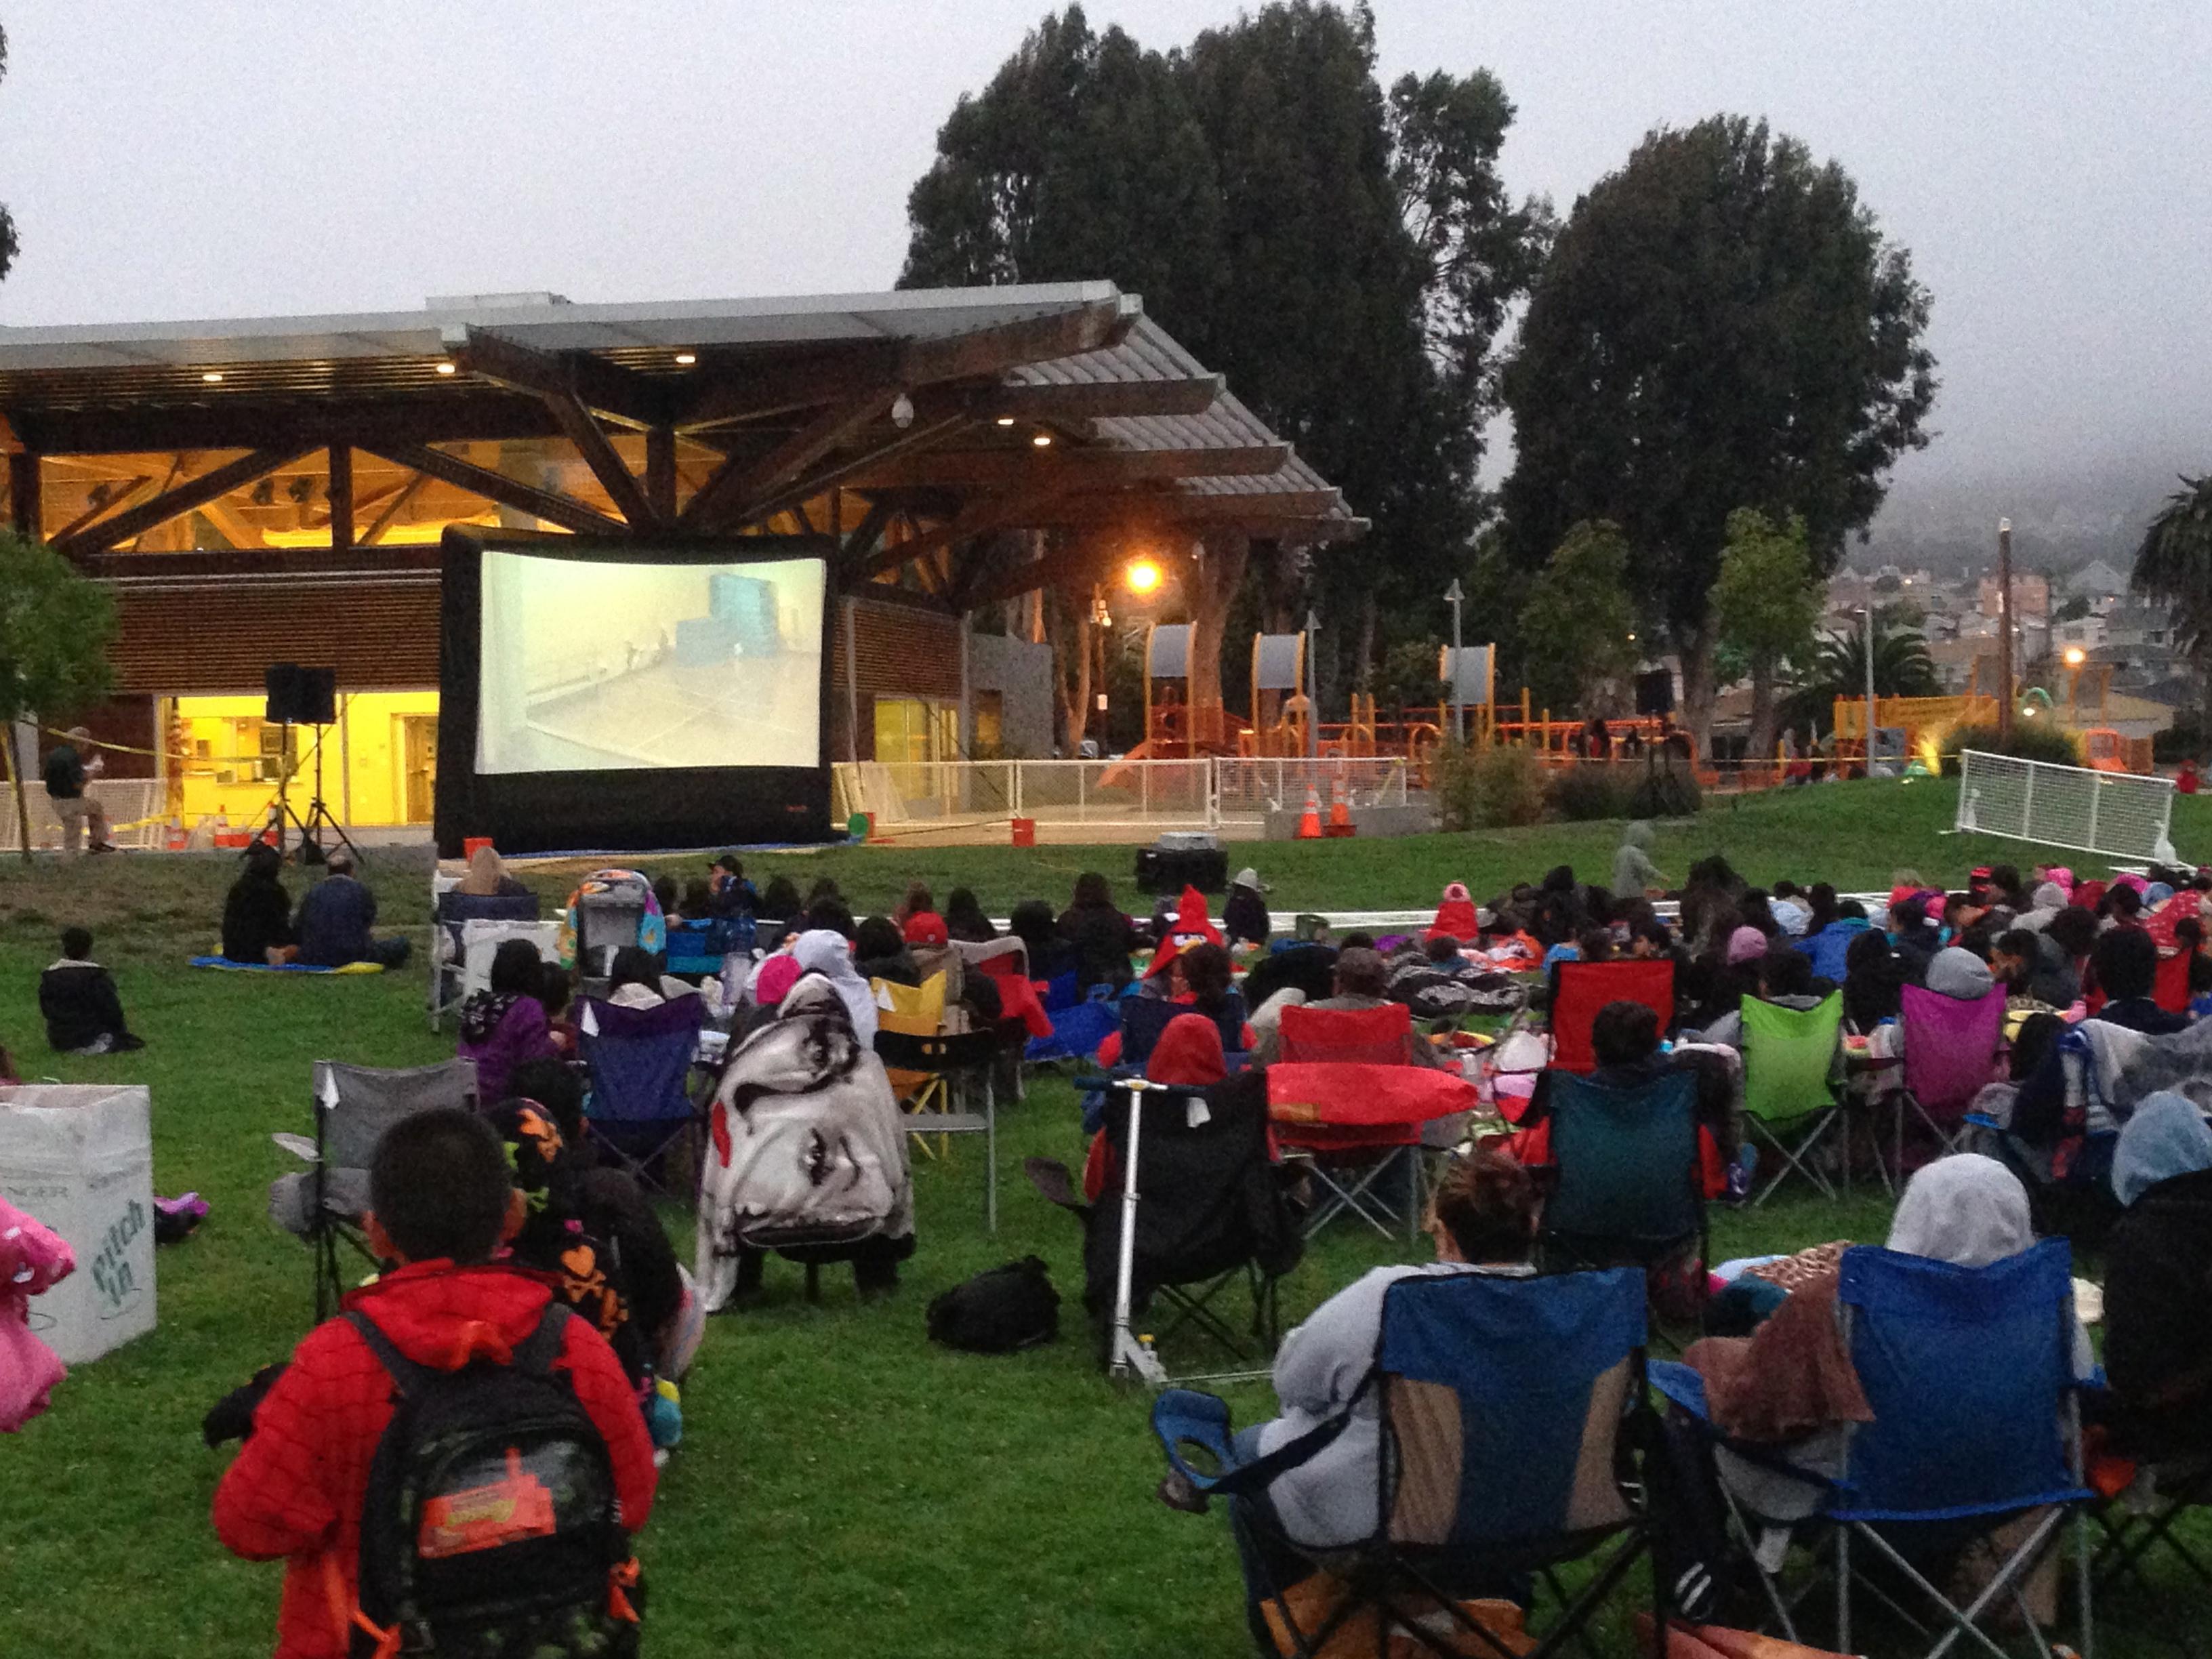 100 backyard movie projector rental outdoor movie screen